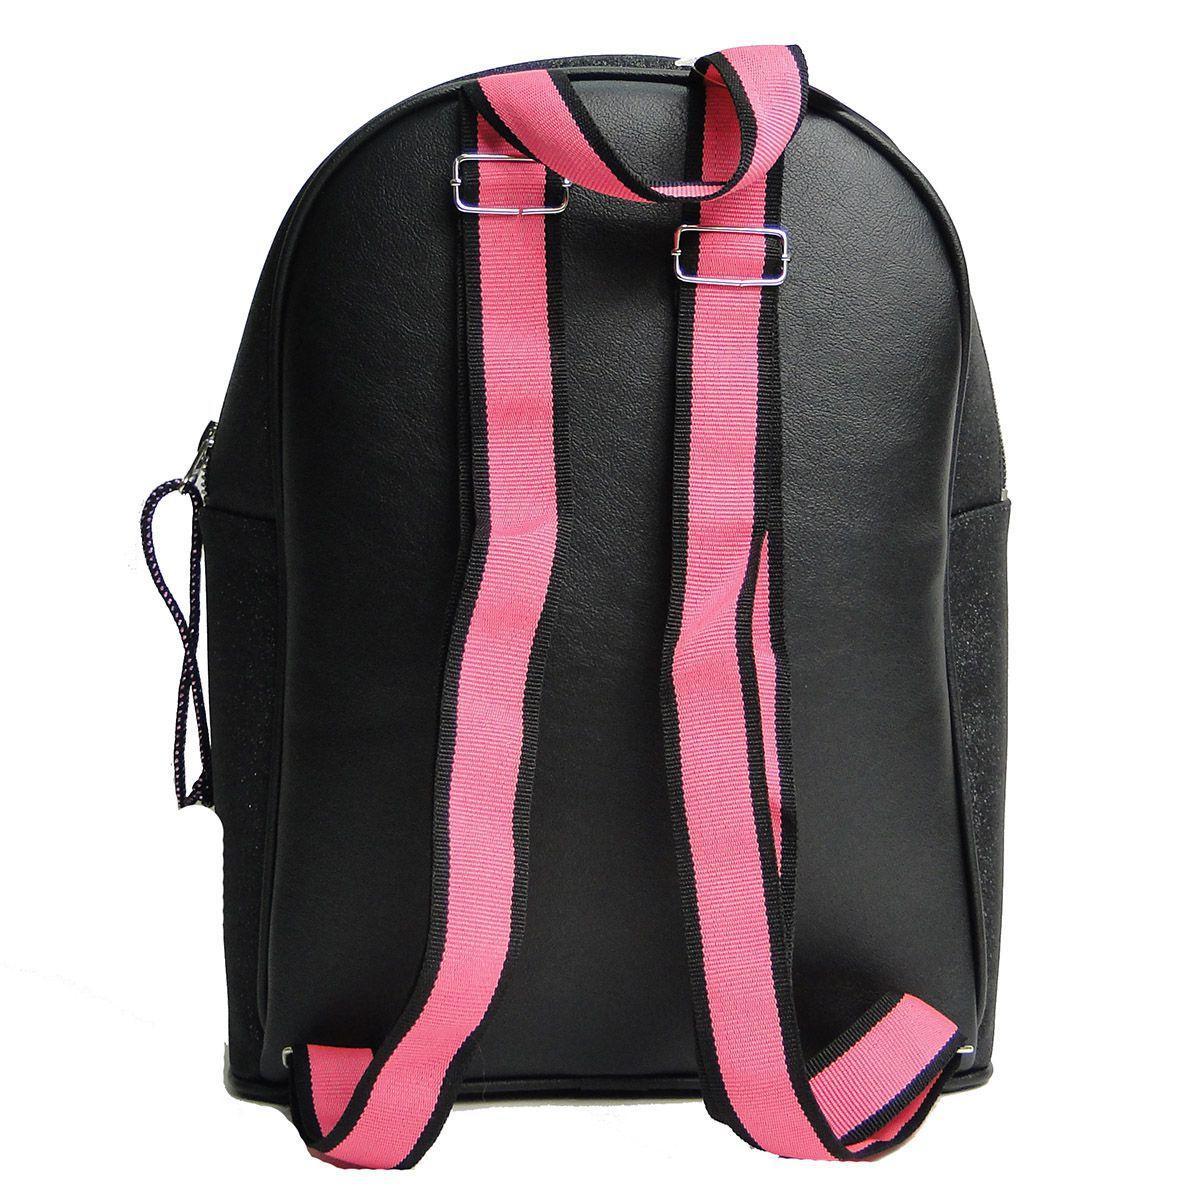 Mochila Twennie Infantil Feminino Preta com Pink